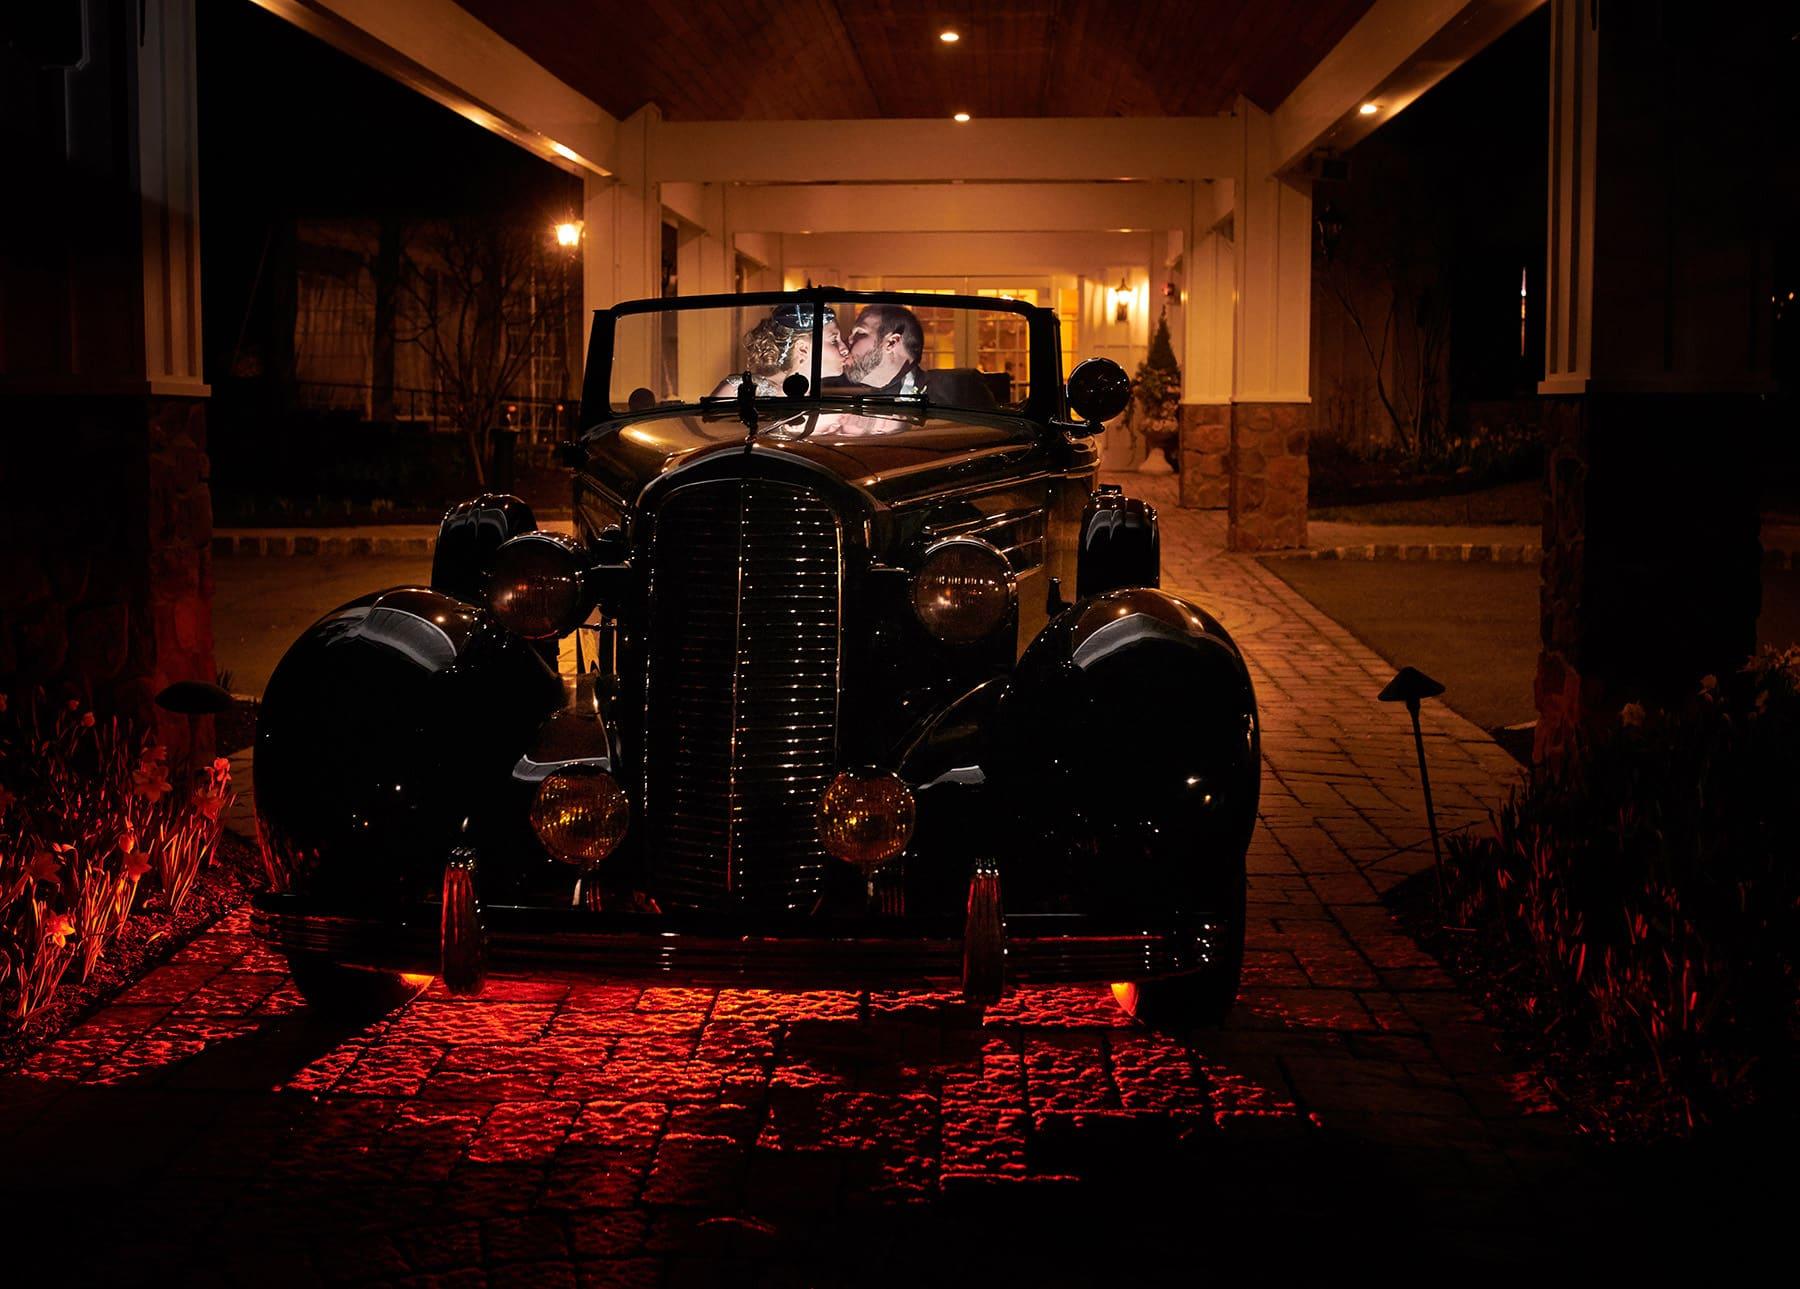 nighttime wedding photo farmhouse grand colonial